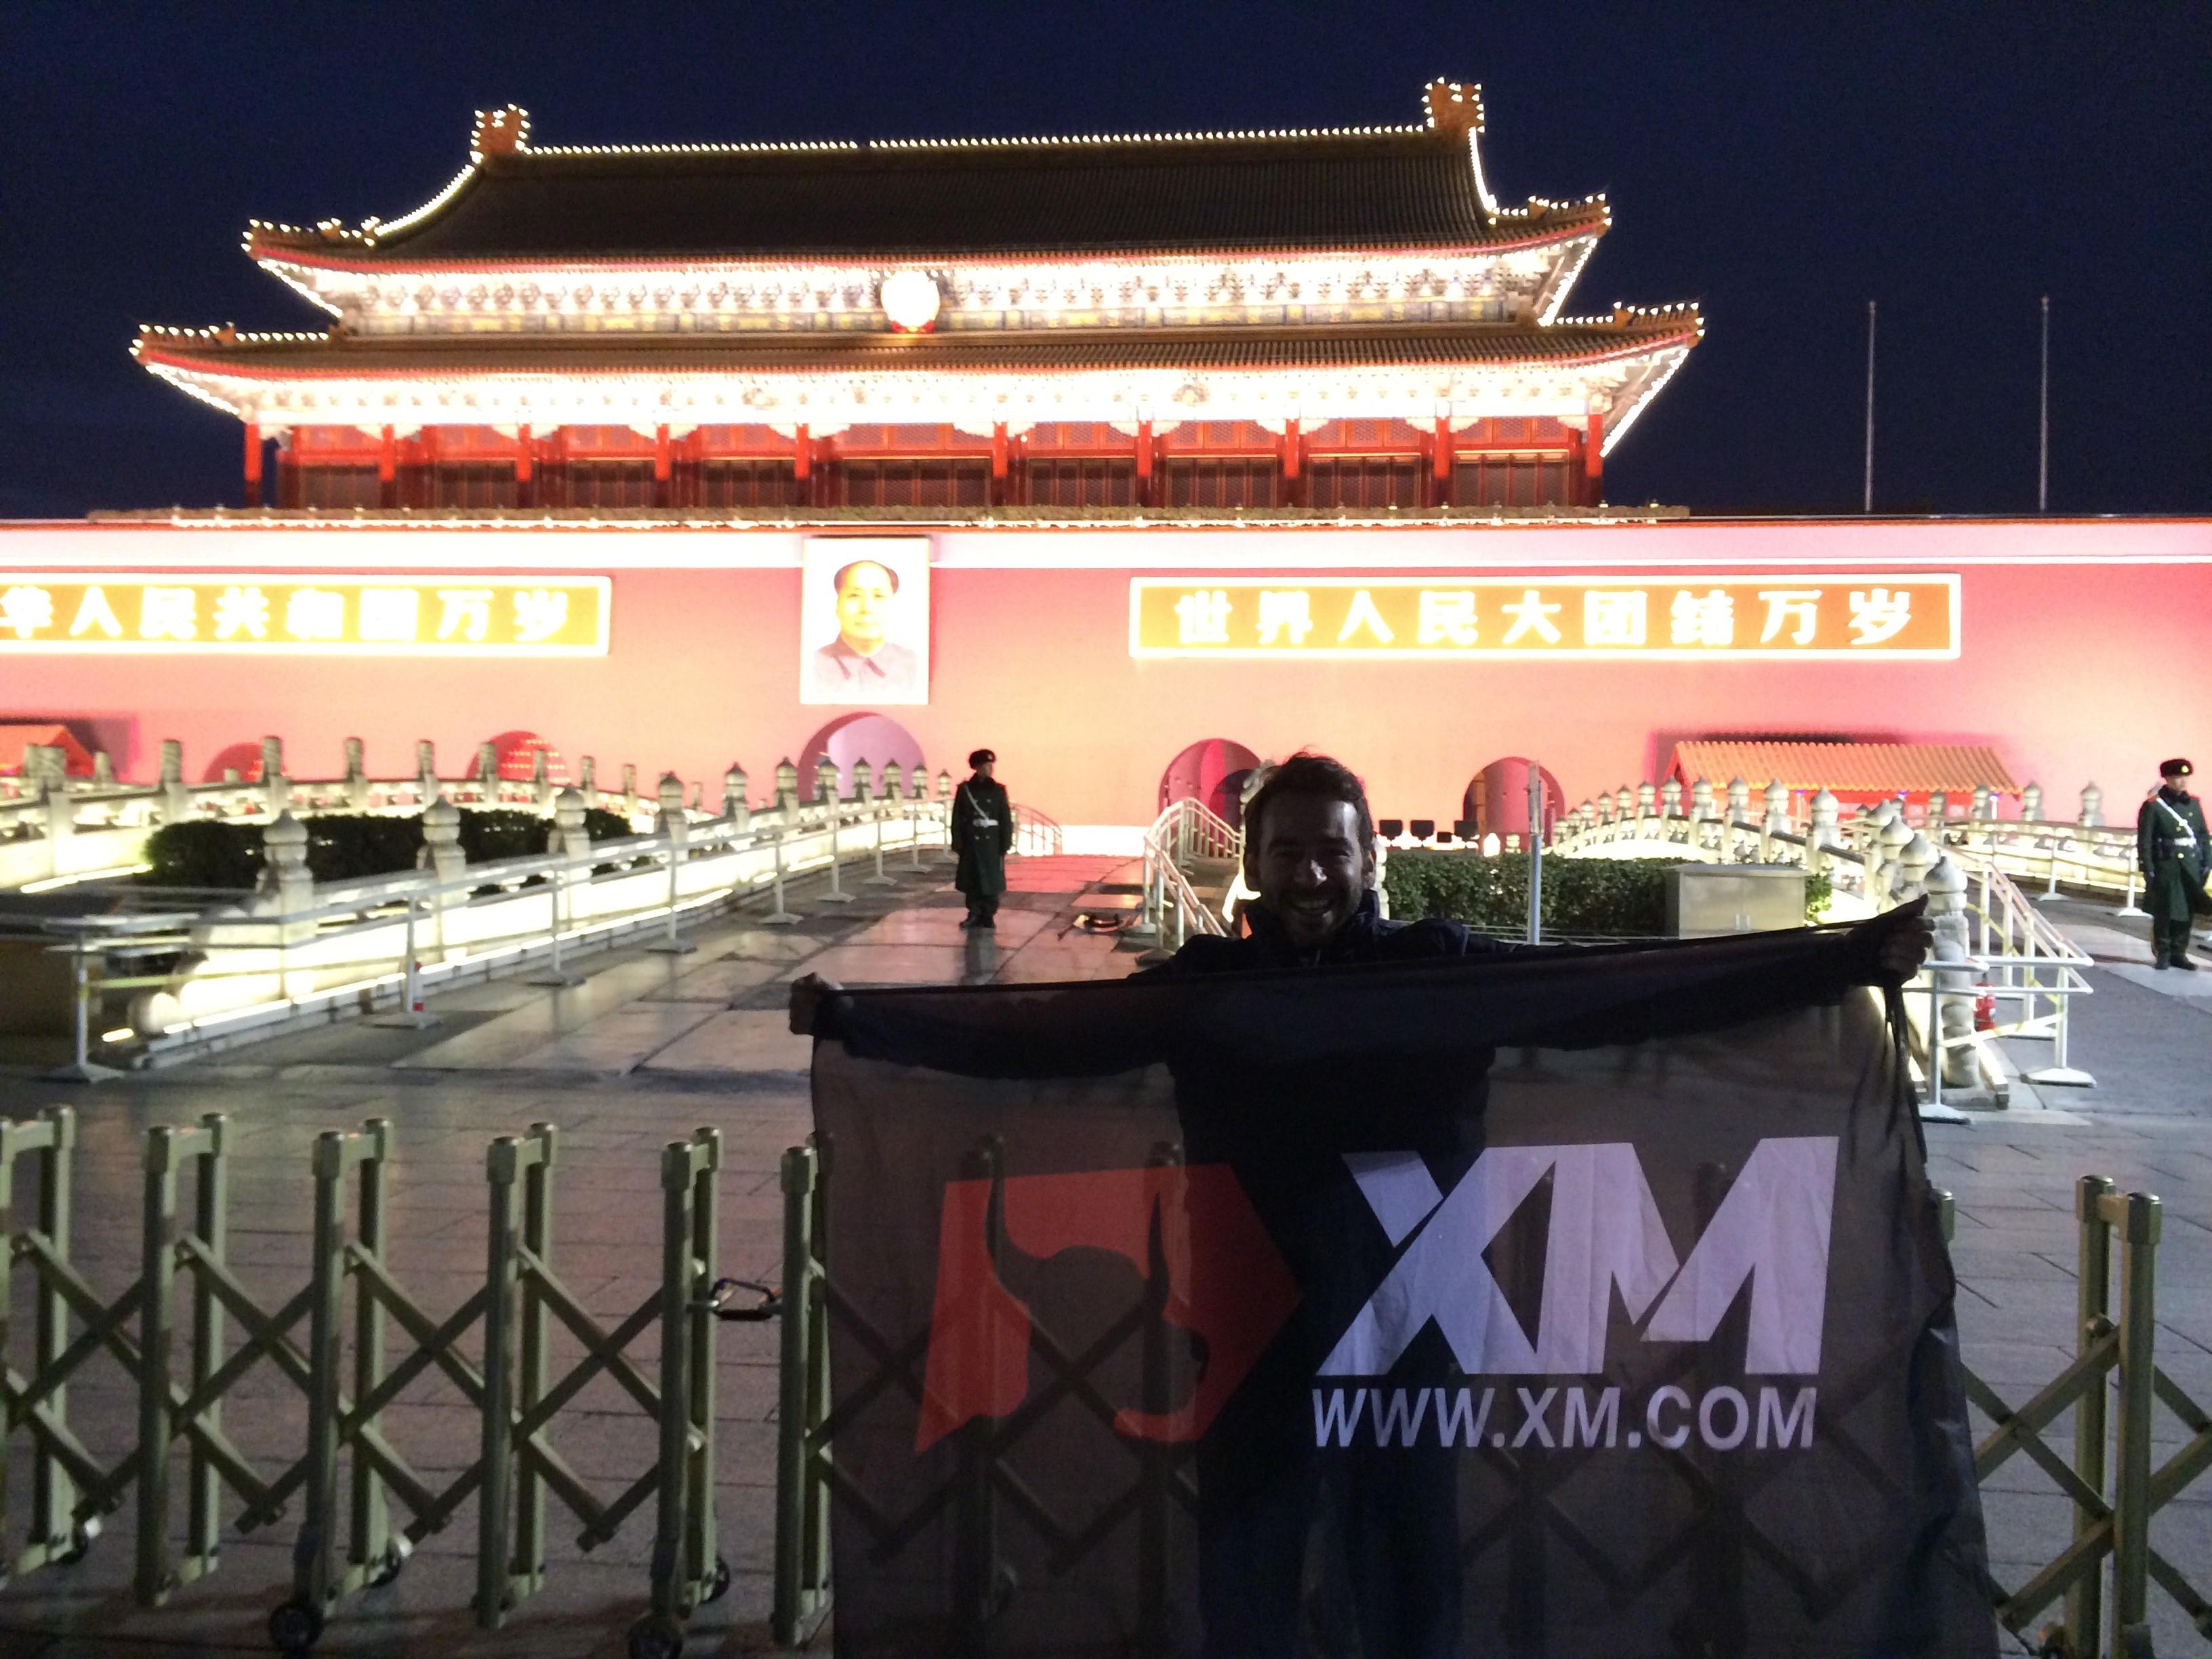 XM Bull meets Mao!